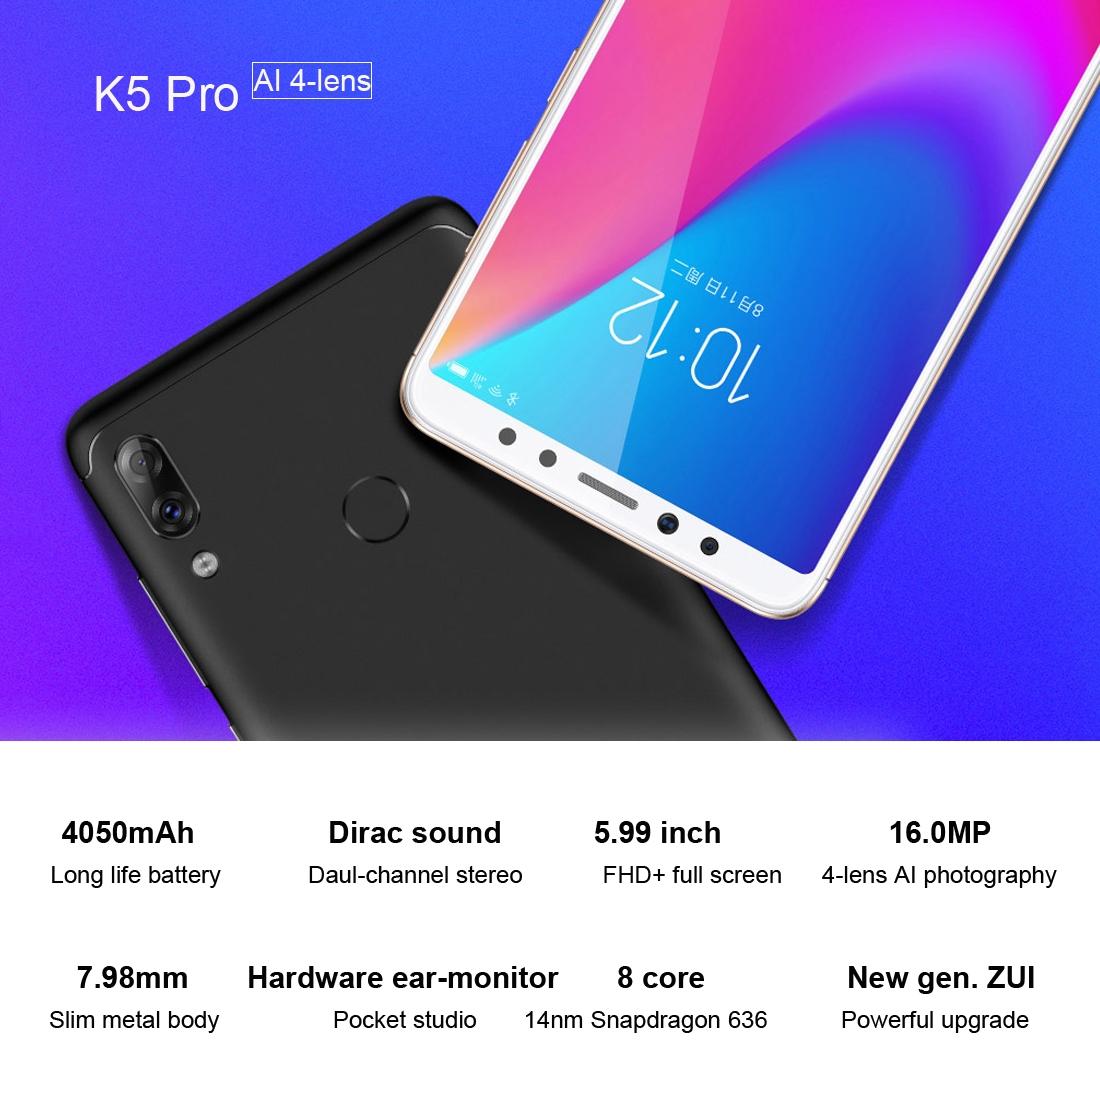 i.ibb.co/9wJ44sZ/Smartphone-6-GB-64-GB-Lenovo-K5-Pro-Preto-5.jpg